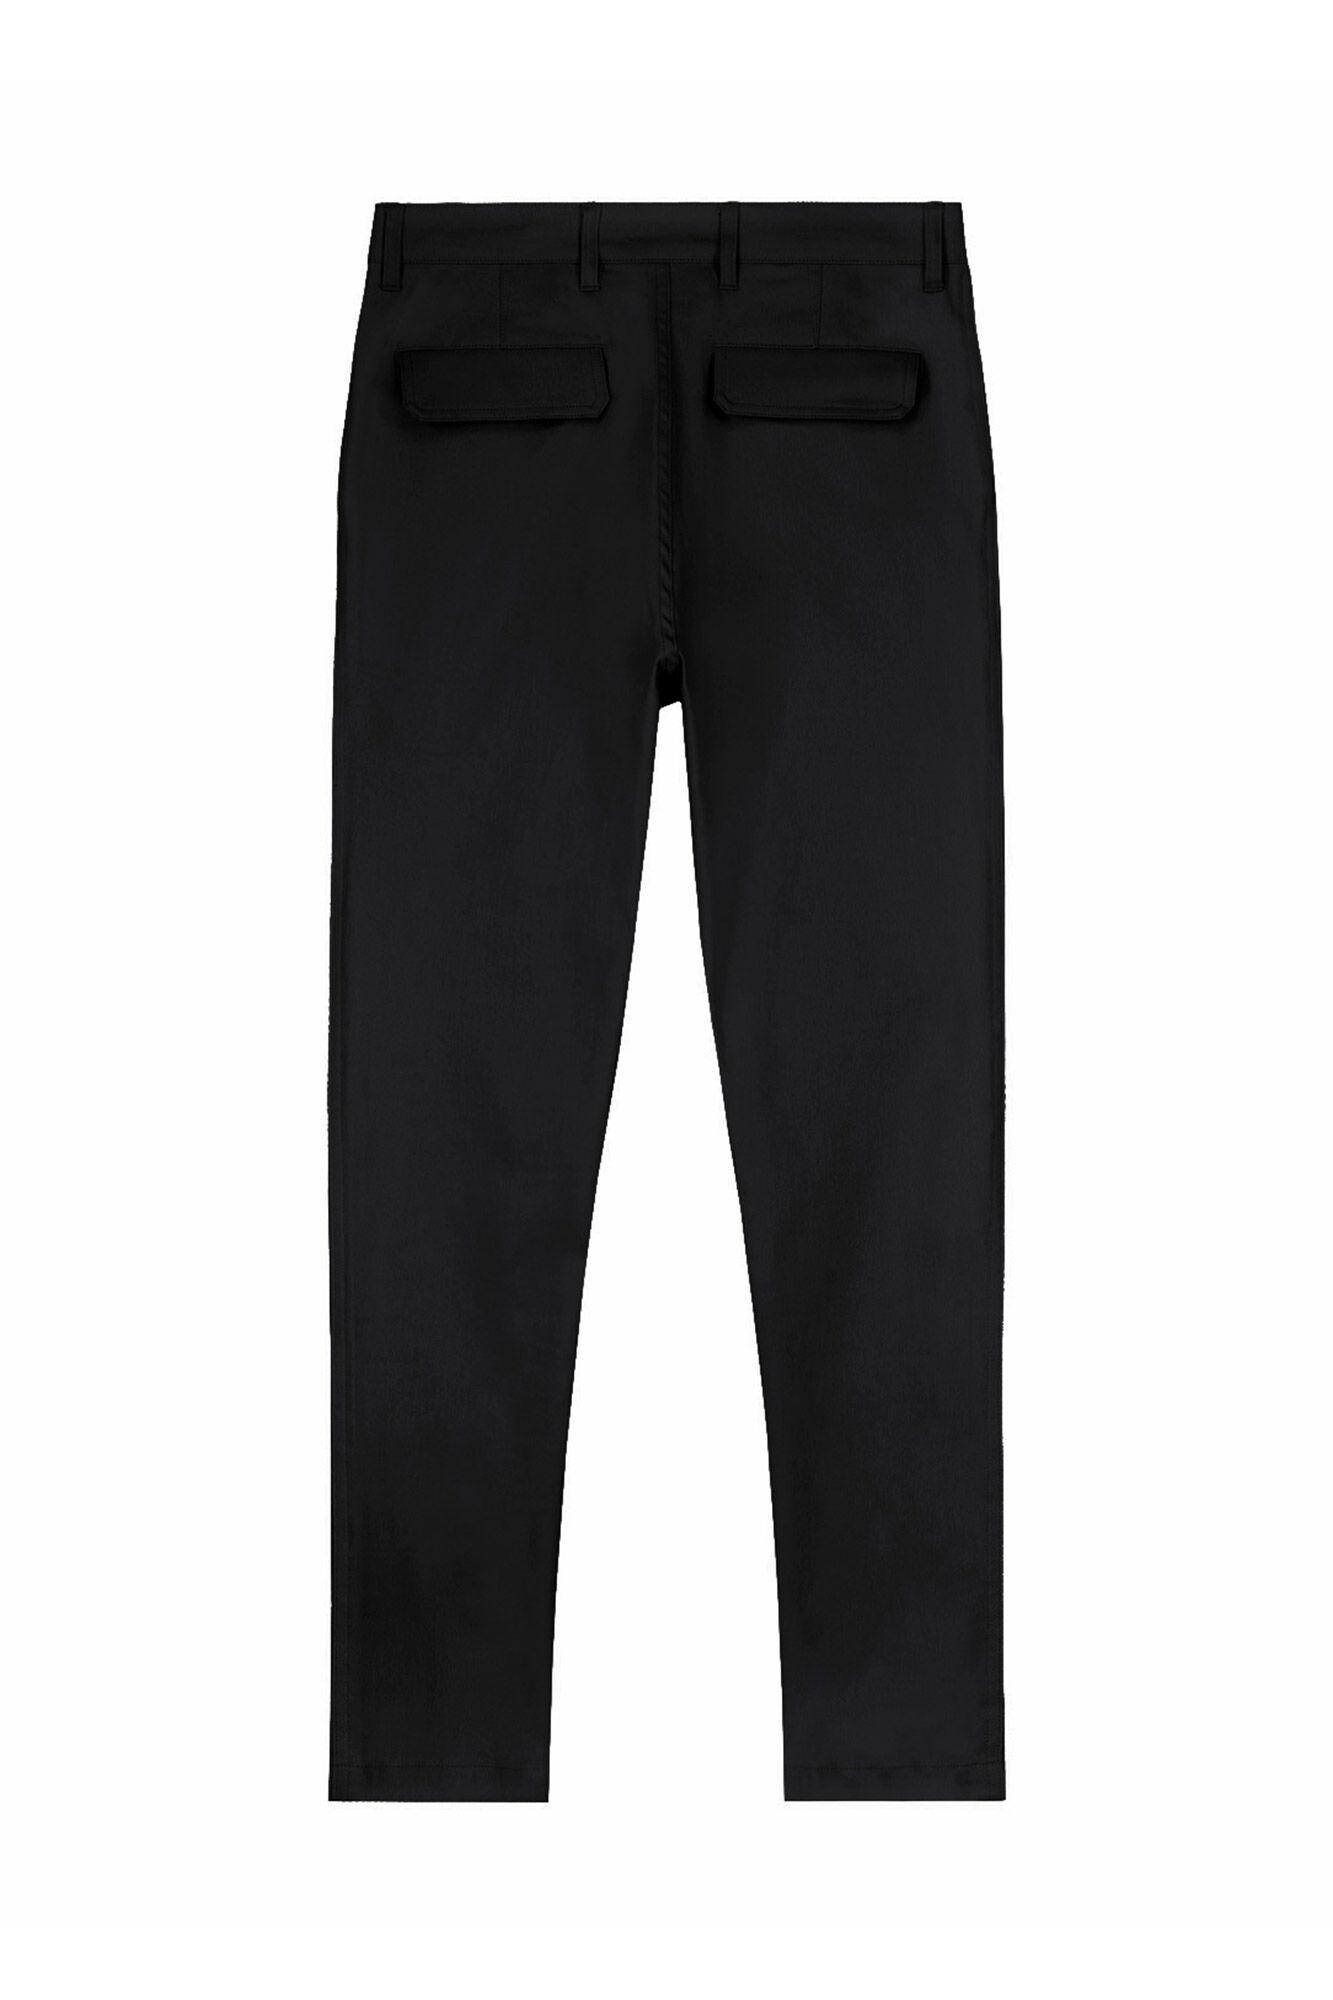 Cargo pants 6651-6679